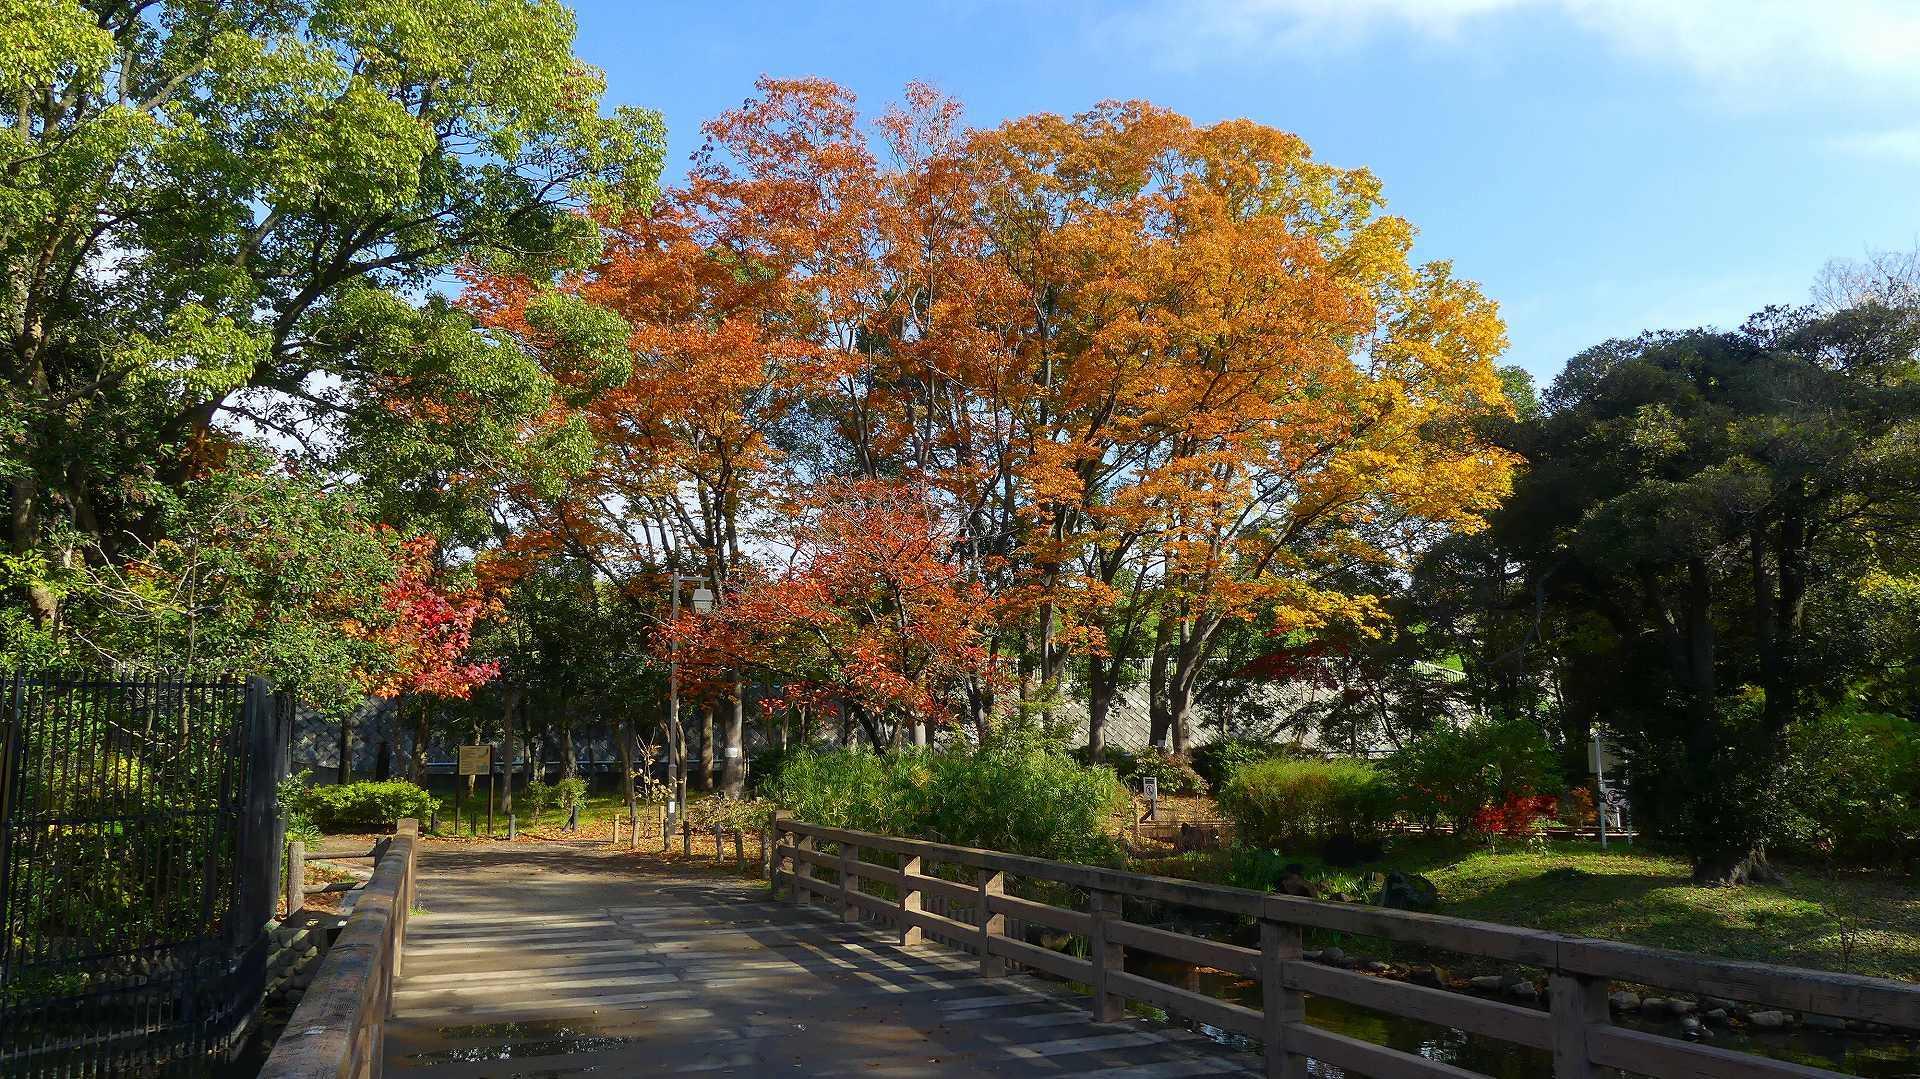 秋色の散歩道_a0185081_09402491.jpg